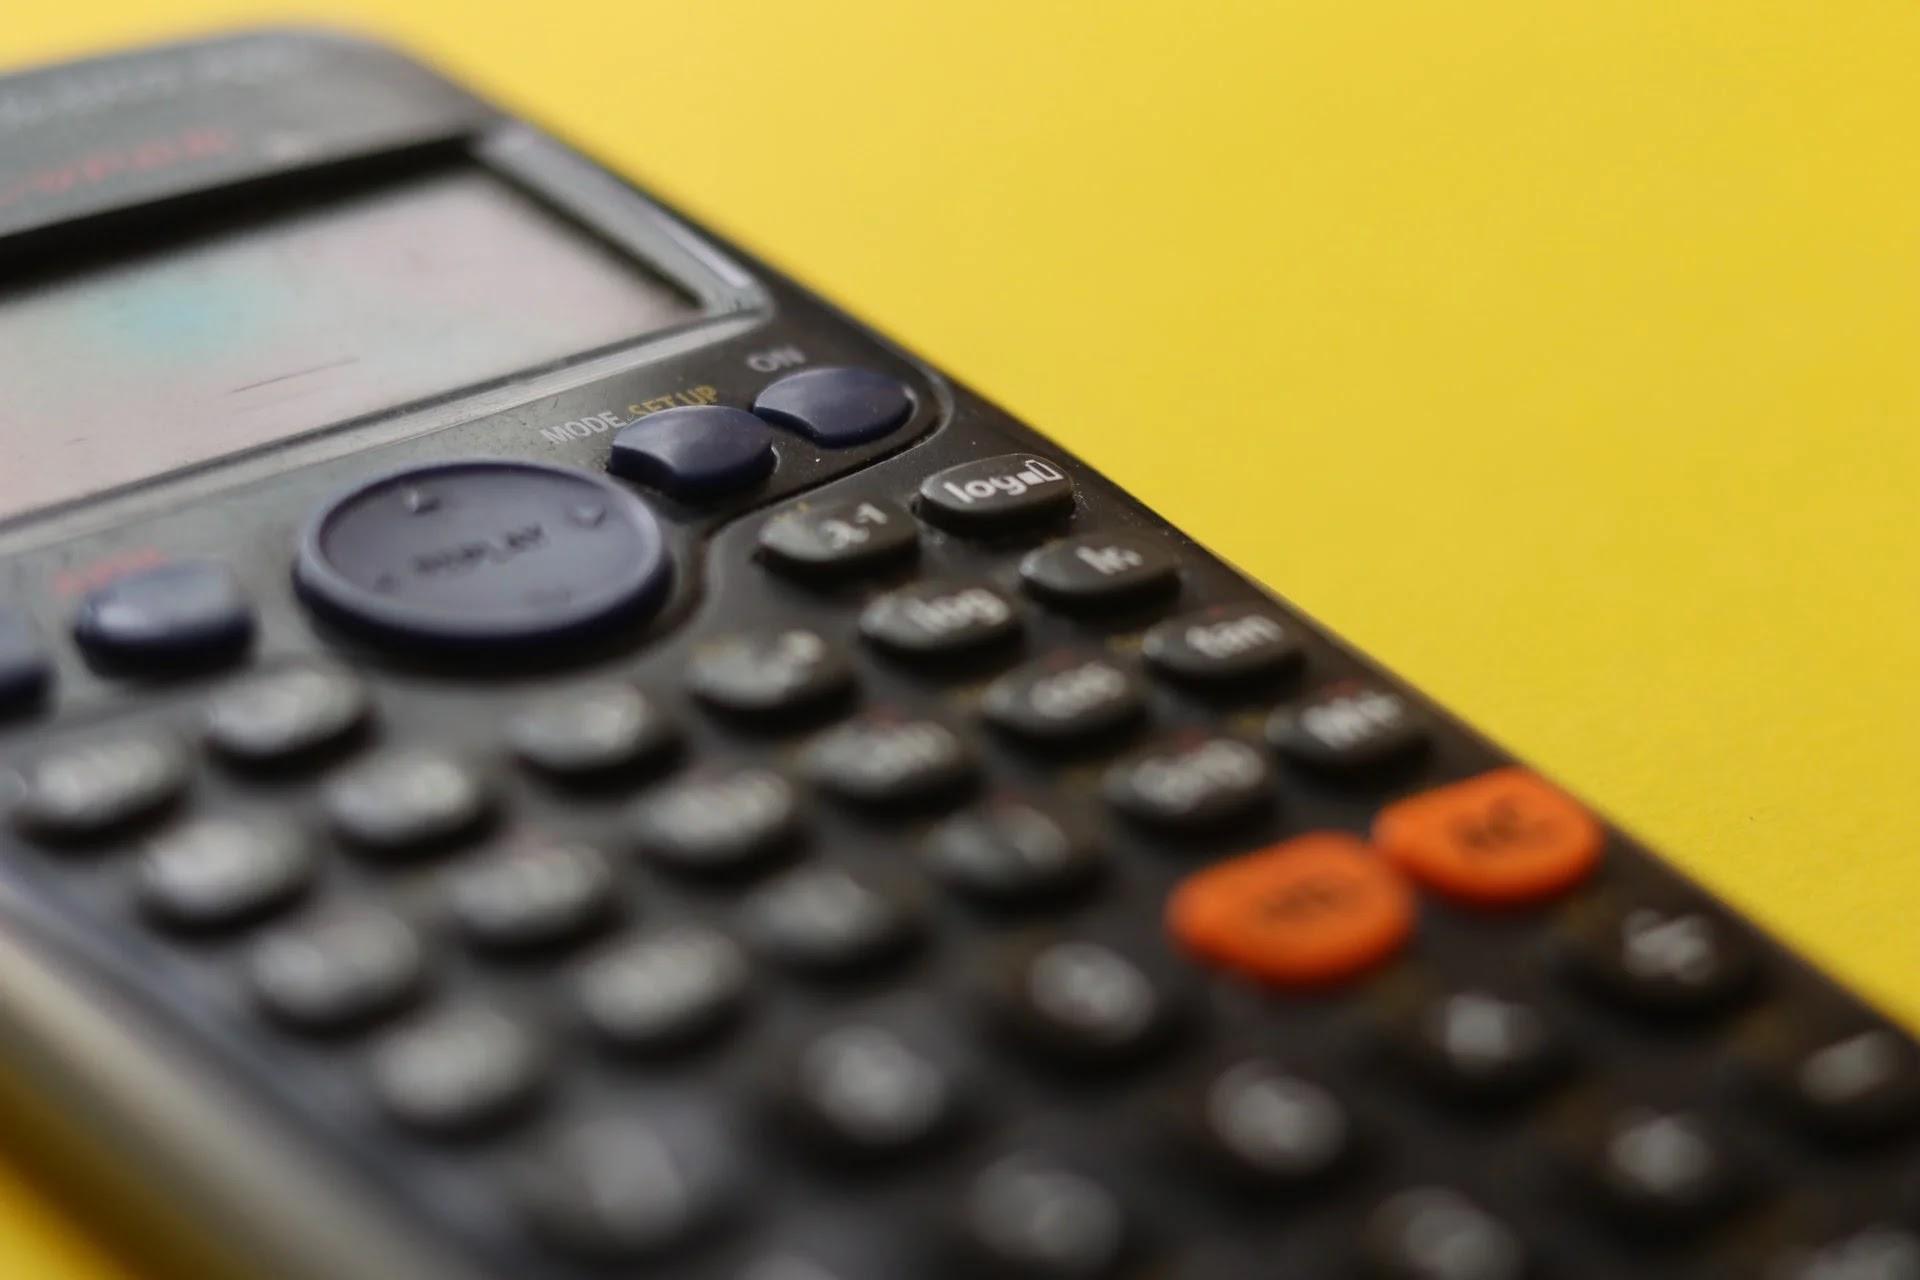 calculator on yellow table